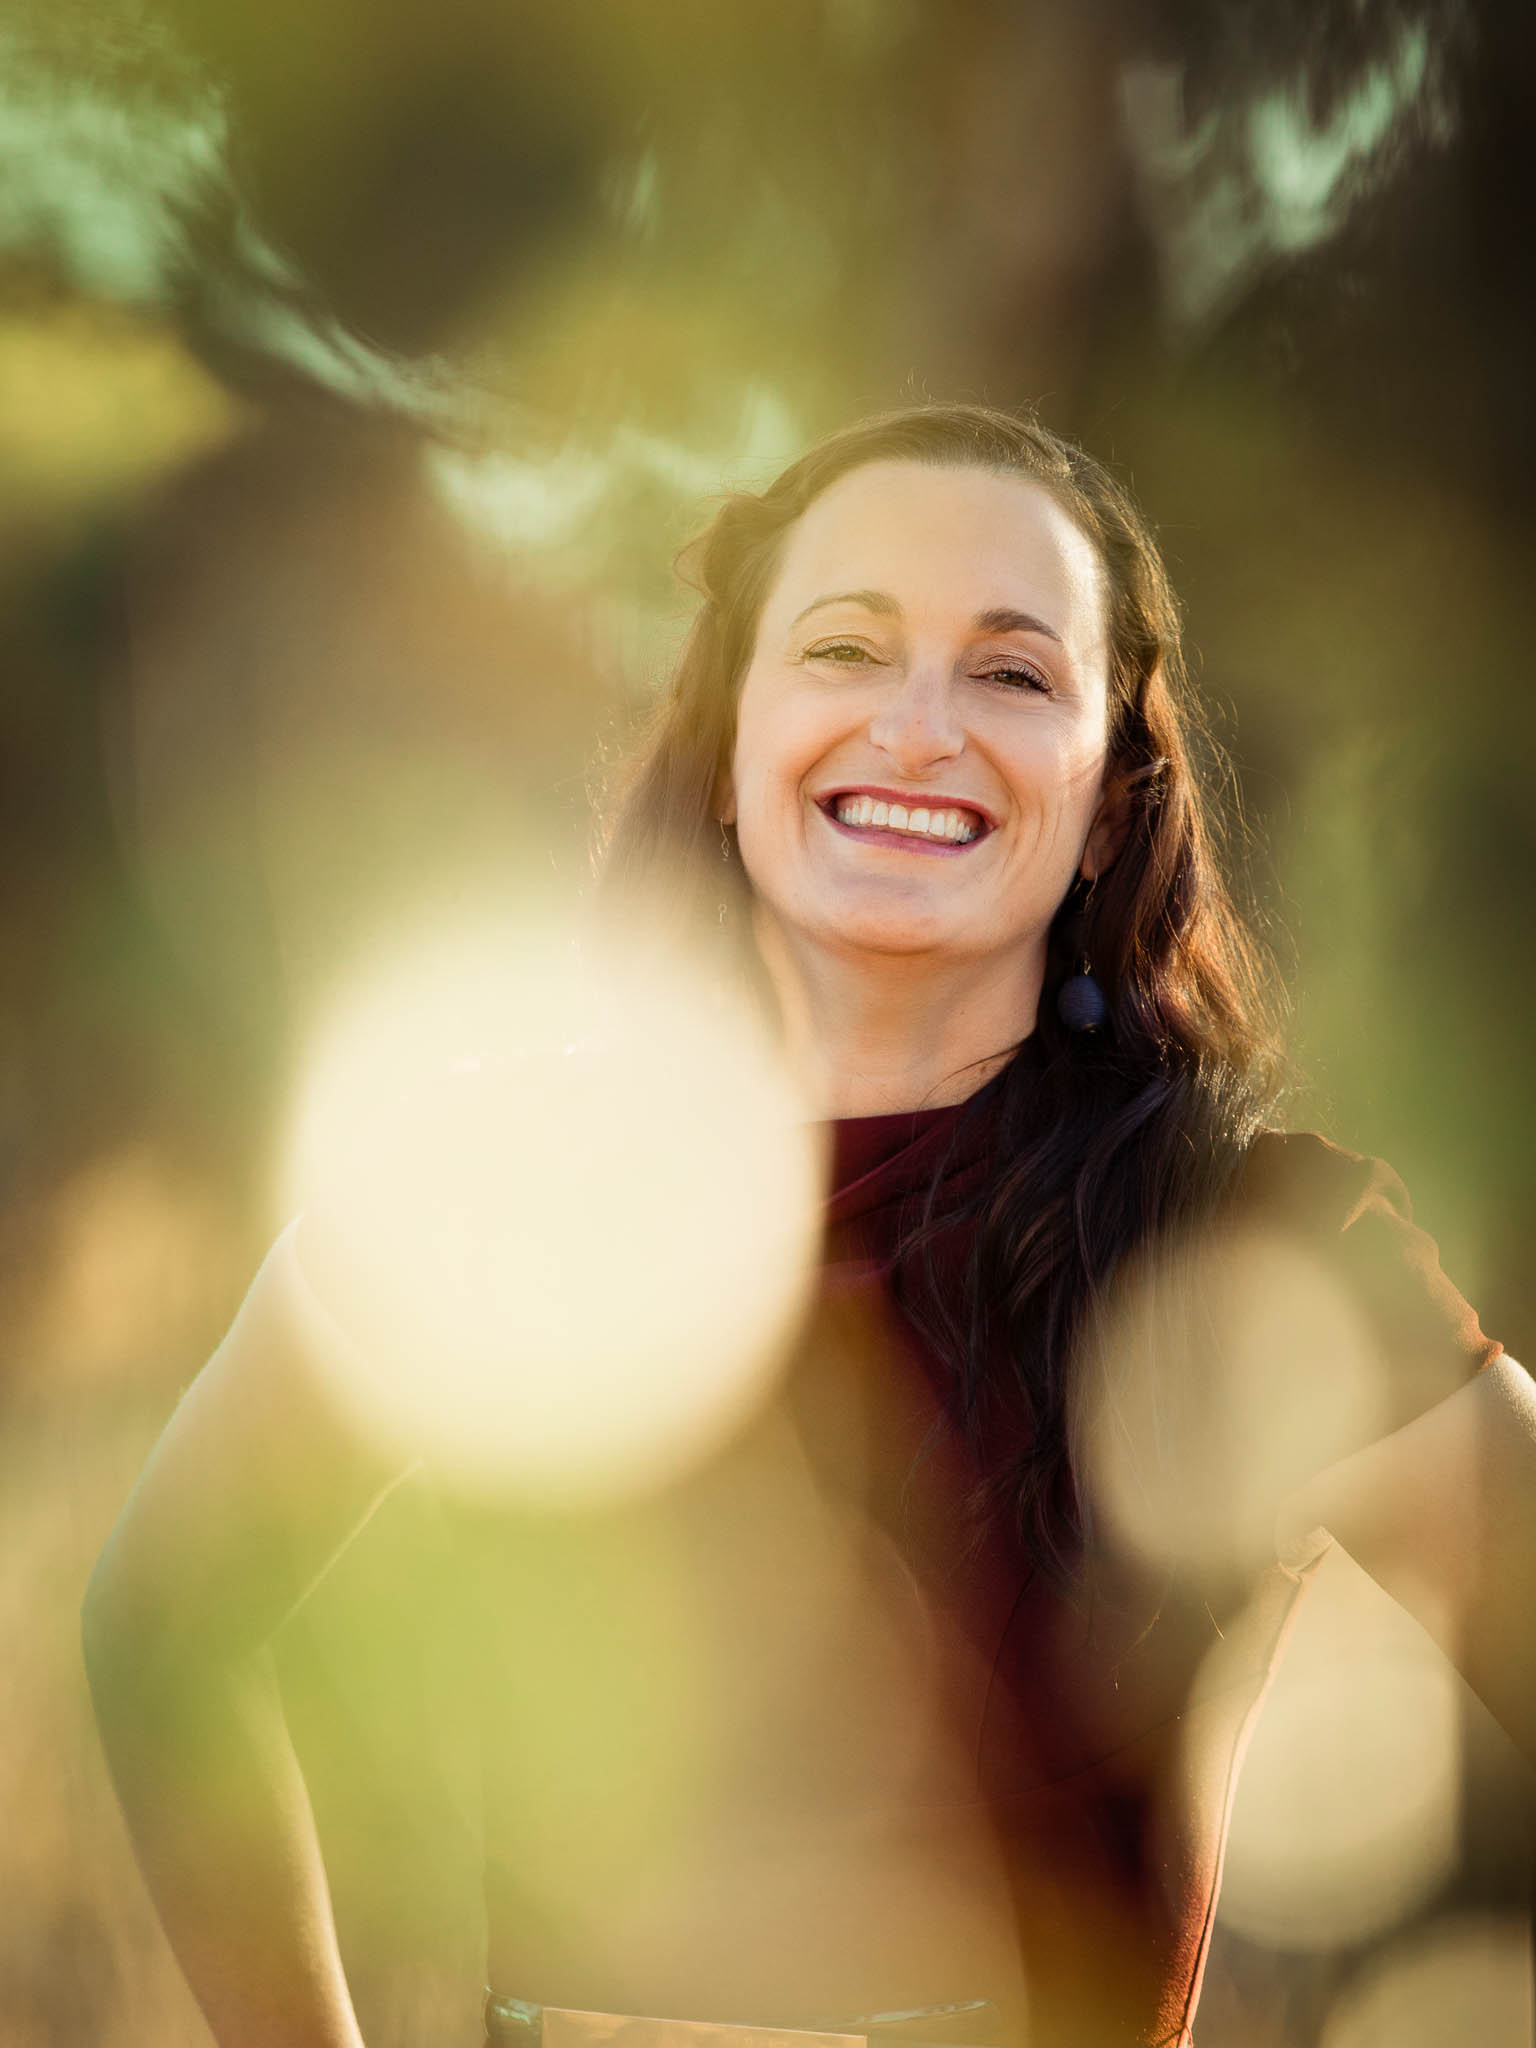 Susan Jacobs Photography_Janine Milne_Personal Branding_Web Ready-9.jpg